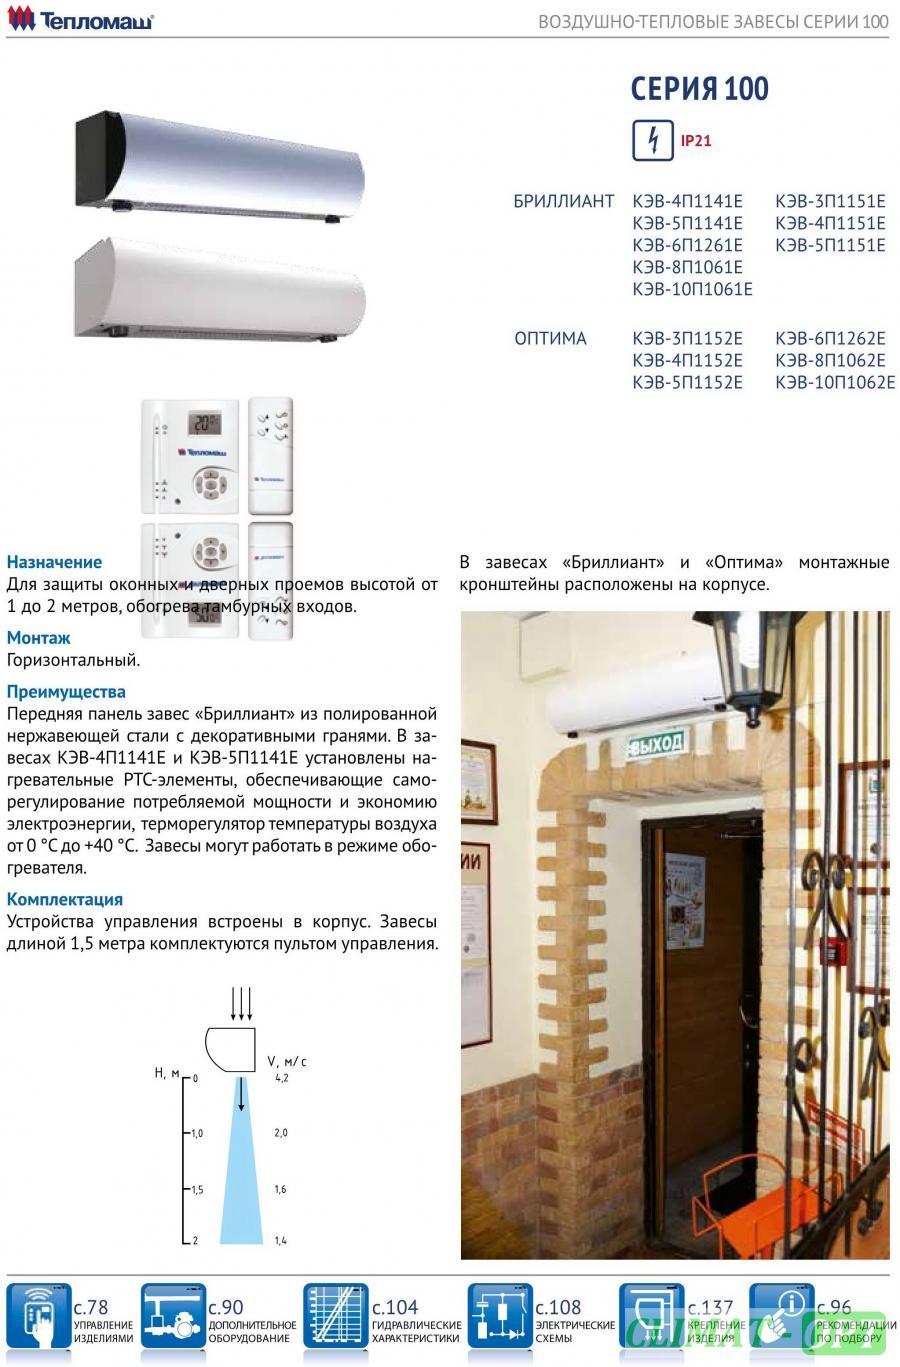 Тепловая завеса Тепломаш КЭВ_П1 с электрическим нагревом серии 100